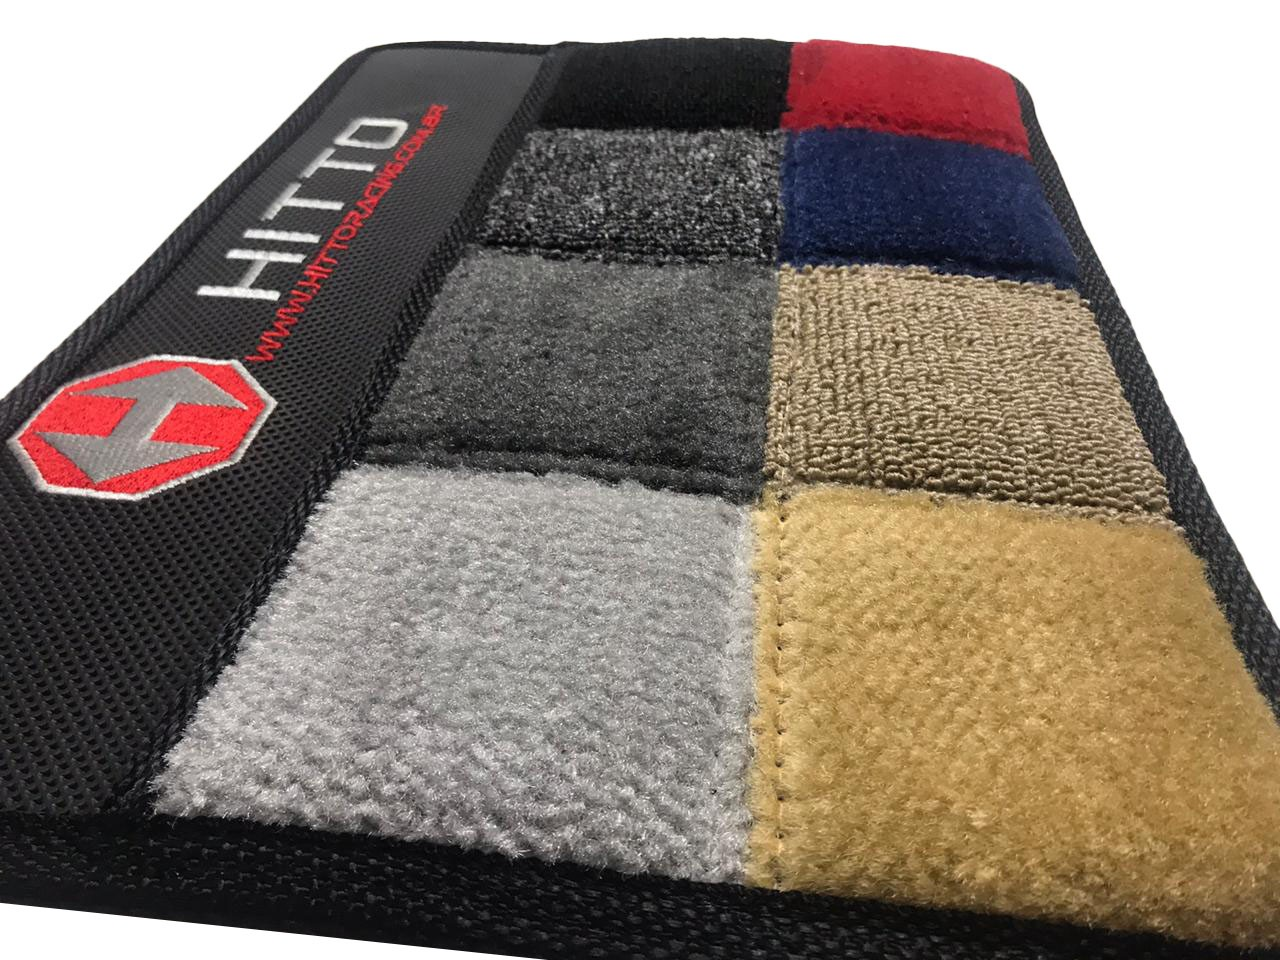 Tapete Volvo Xc 60 Carpete Bege Premium Base Pinada